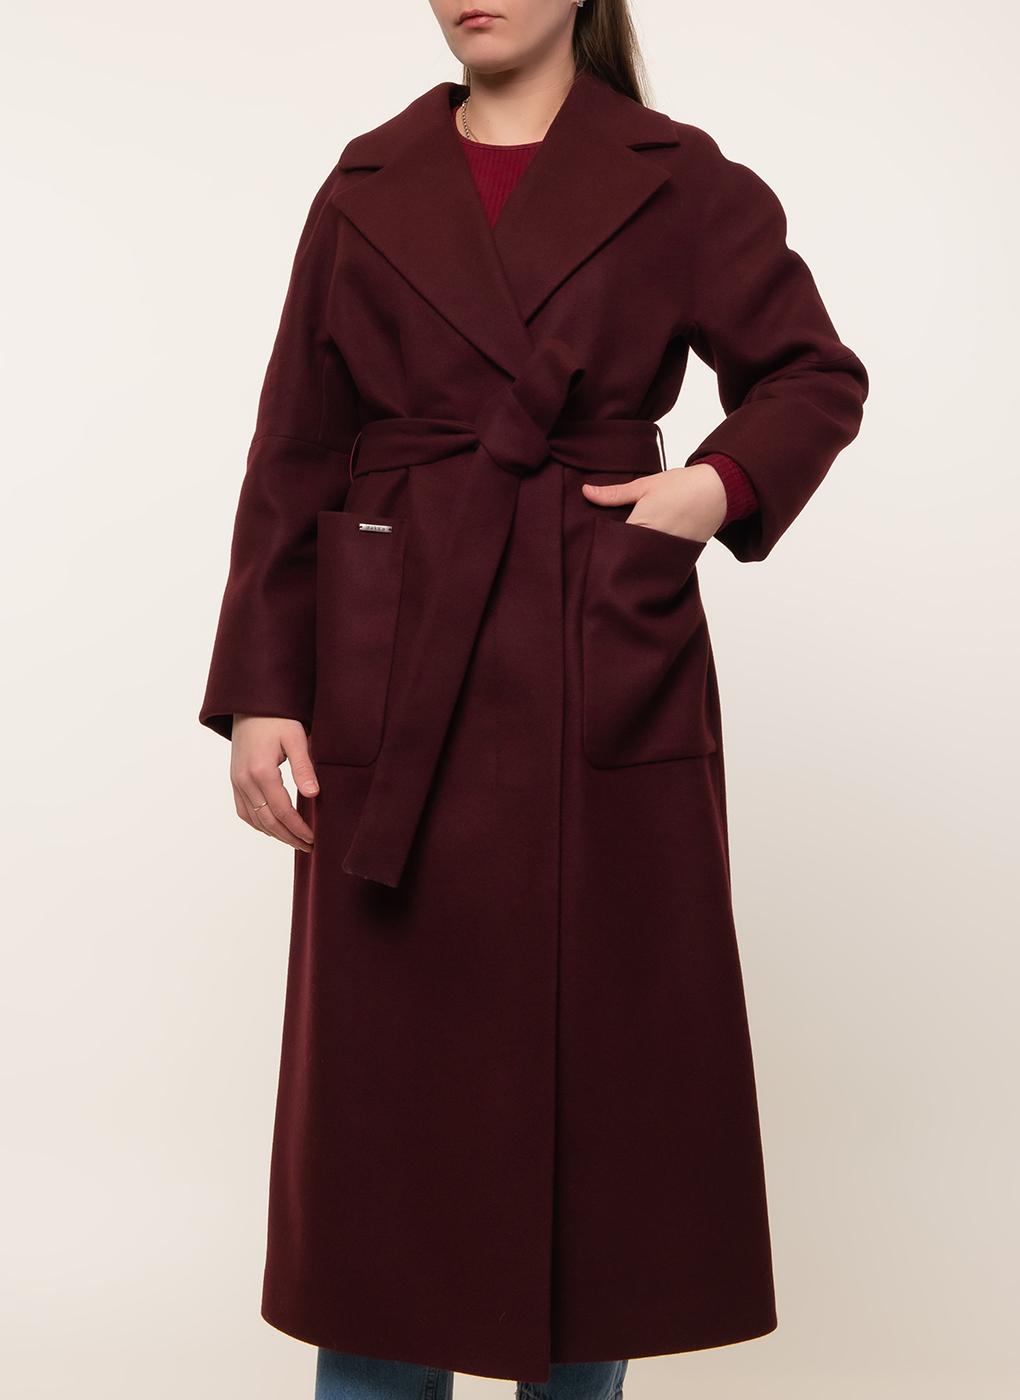 Пальто шерстяное 88, idekka фото